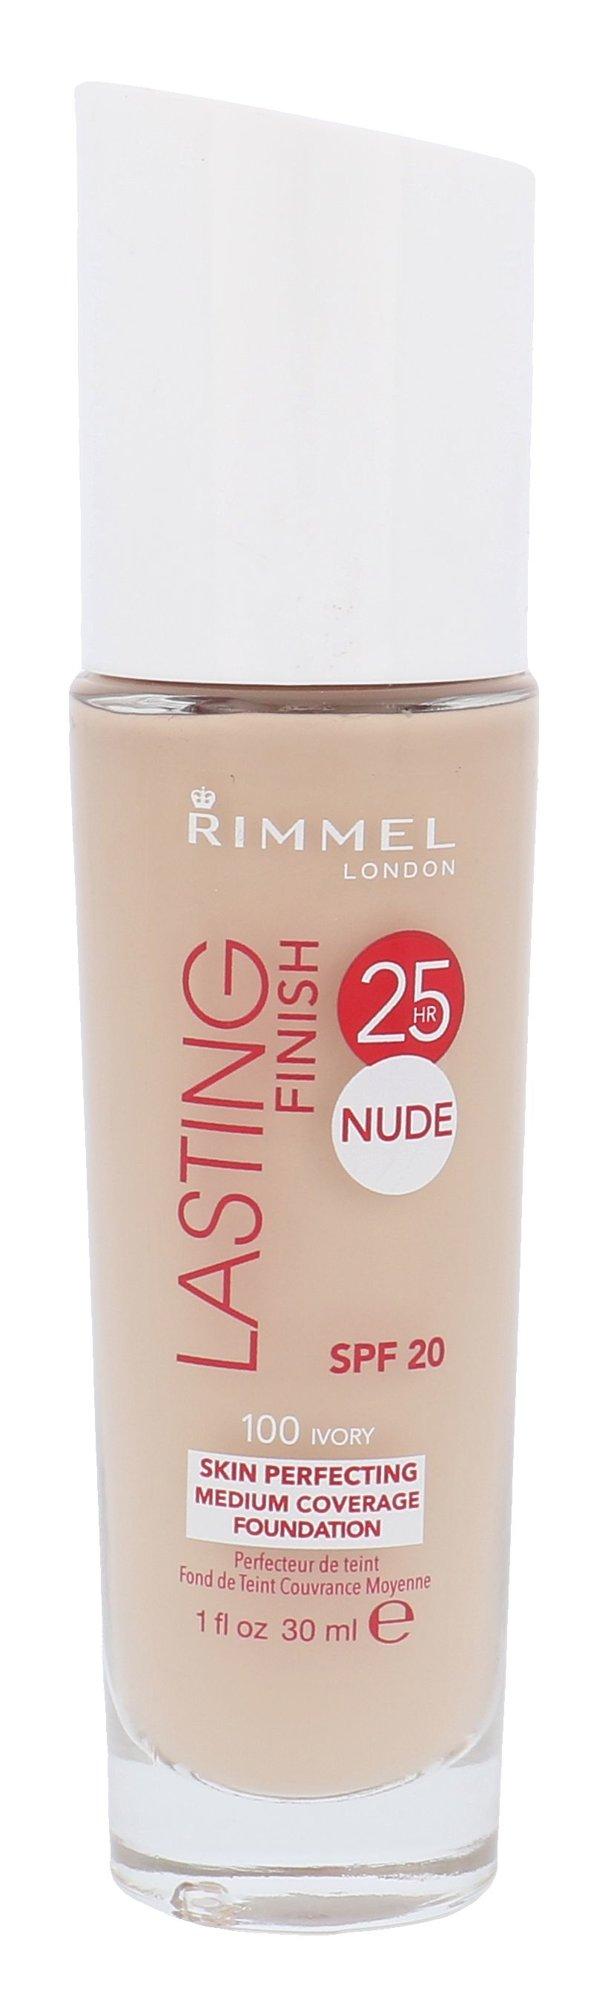 Rimmel London Lasting Finish 25h Nude Foundation Cosmetic 30ml 100 Ivory